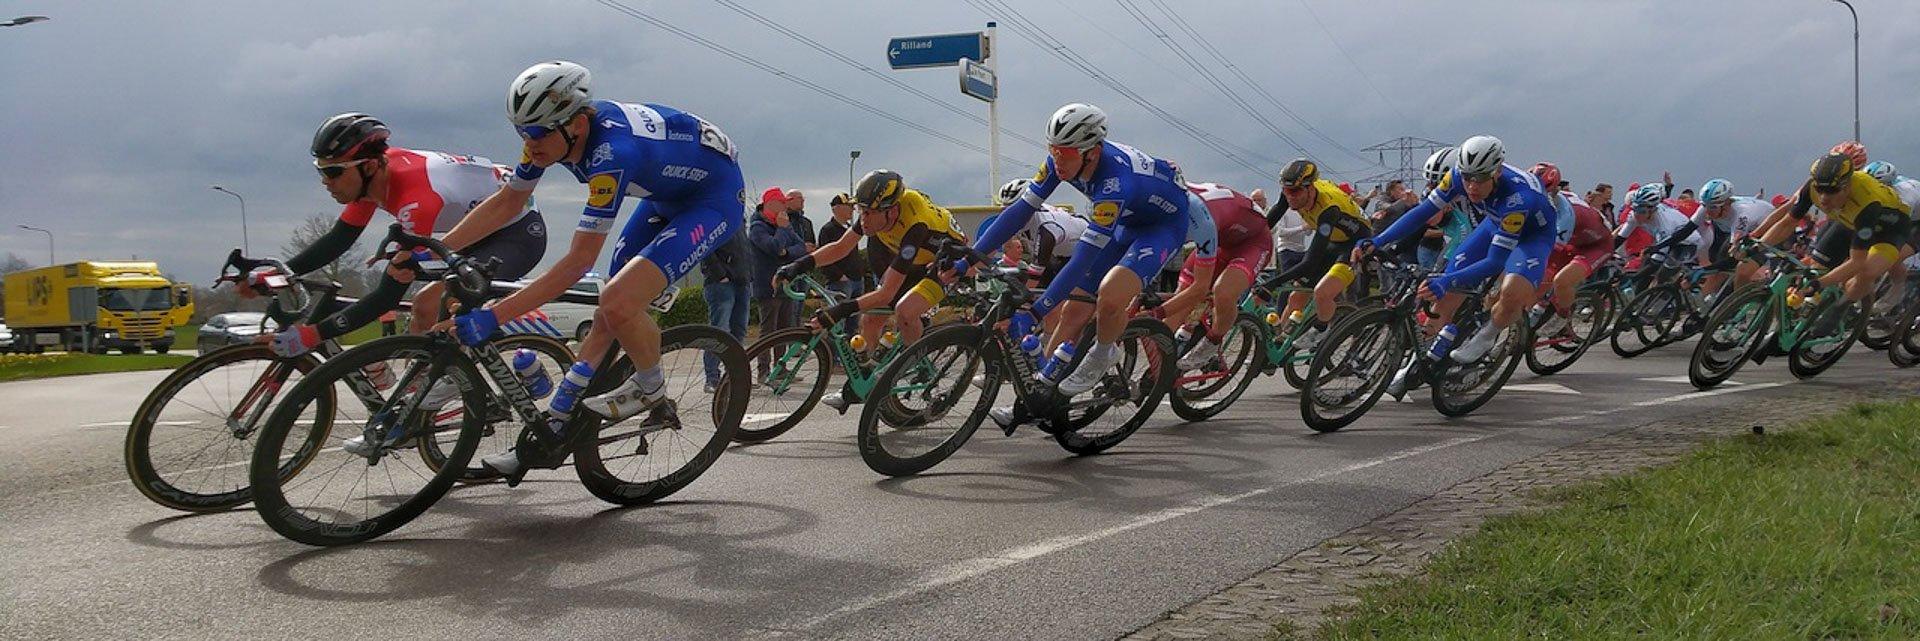 Ardennes classics